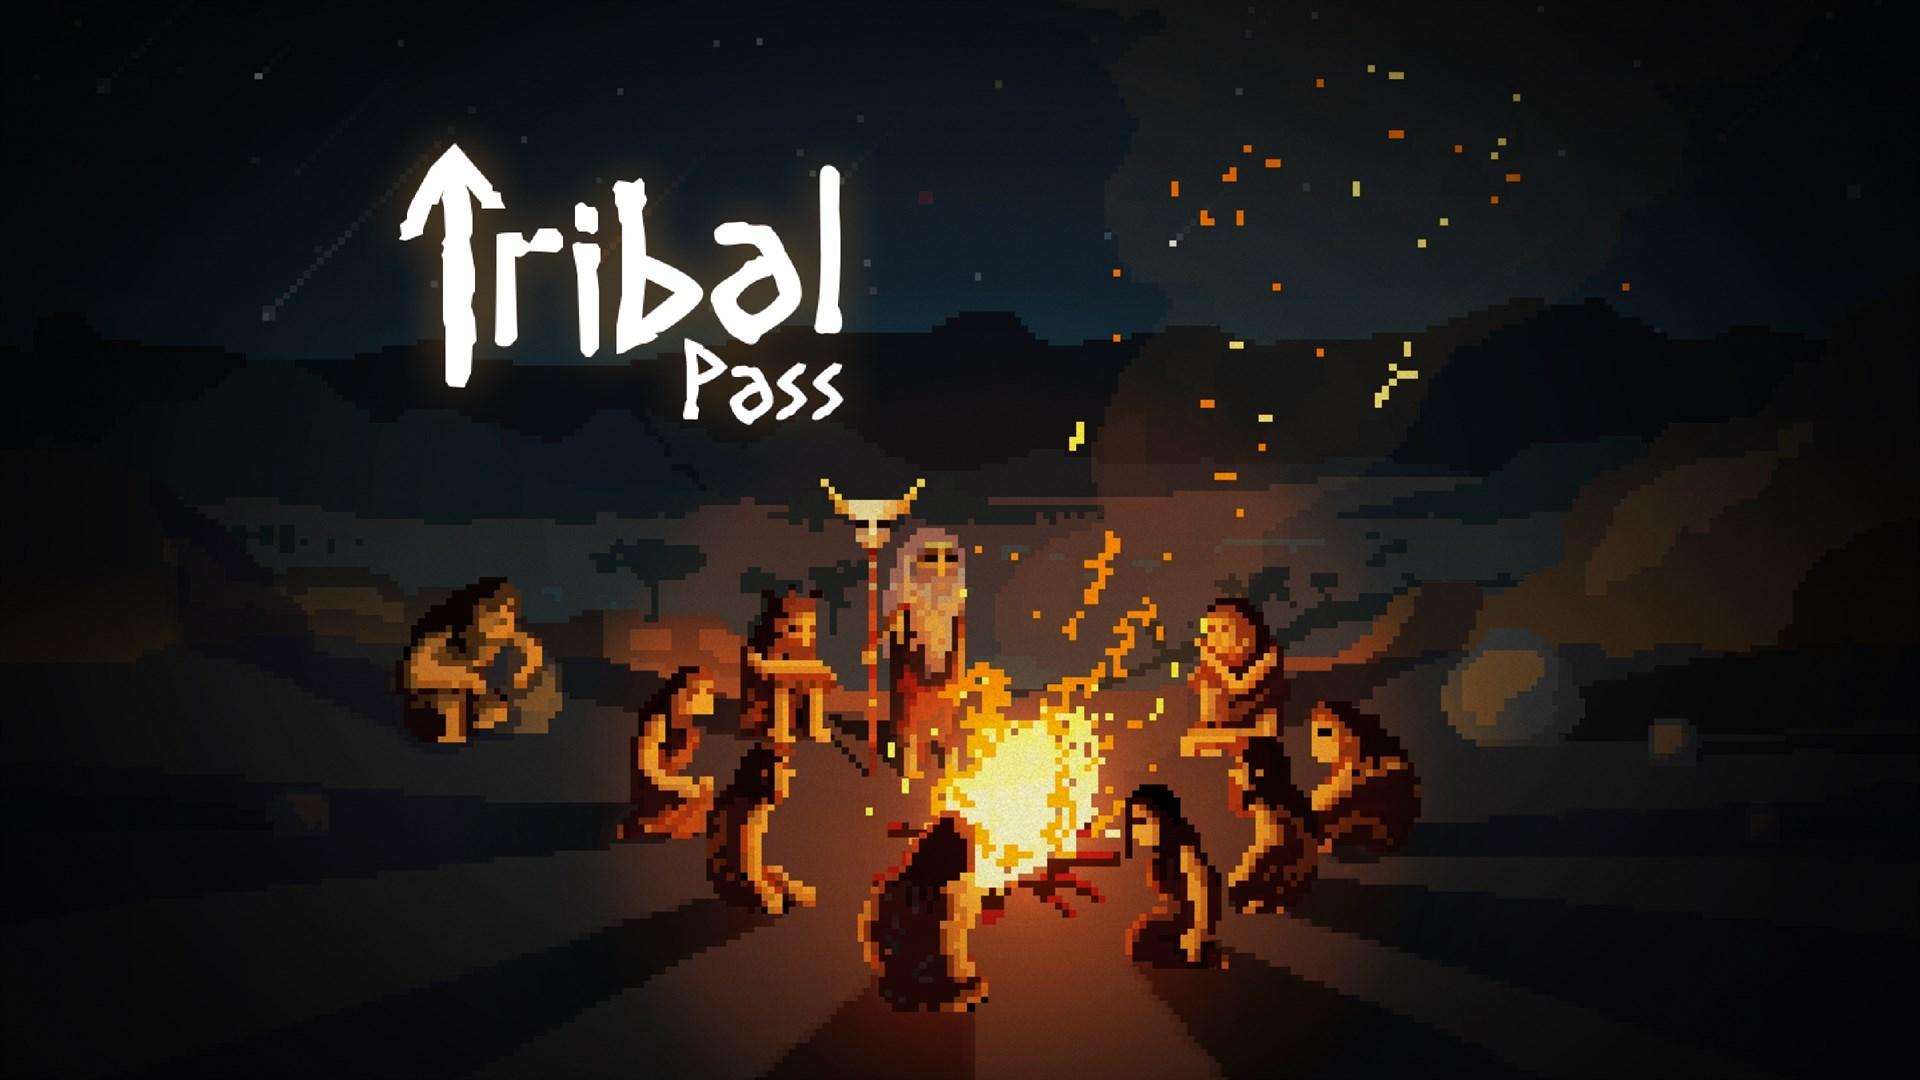 tribal pass video game wallpaper 74013